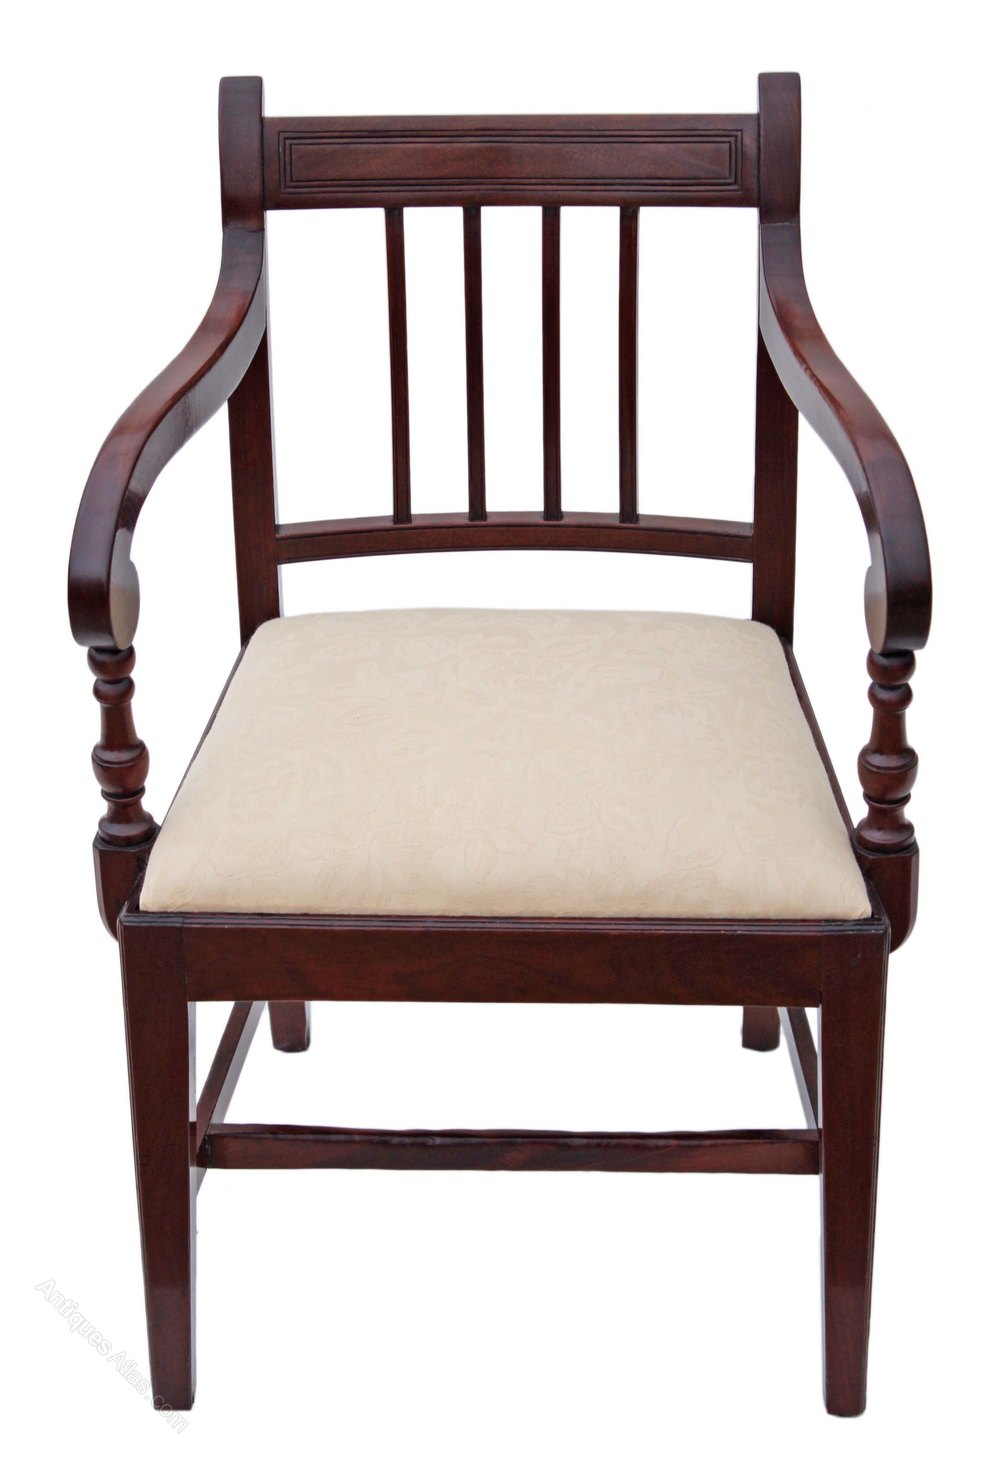 Set Of 8 6 2 Georgian Mahogany Dining Chairs  : Setof862Georgianmahogas462a1162z 2 from www.antiquesatlas.com size 1000 x 1467 jpeg 109kB